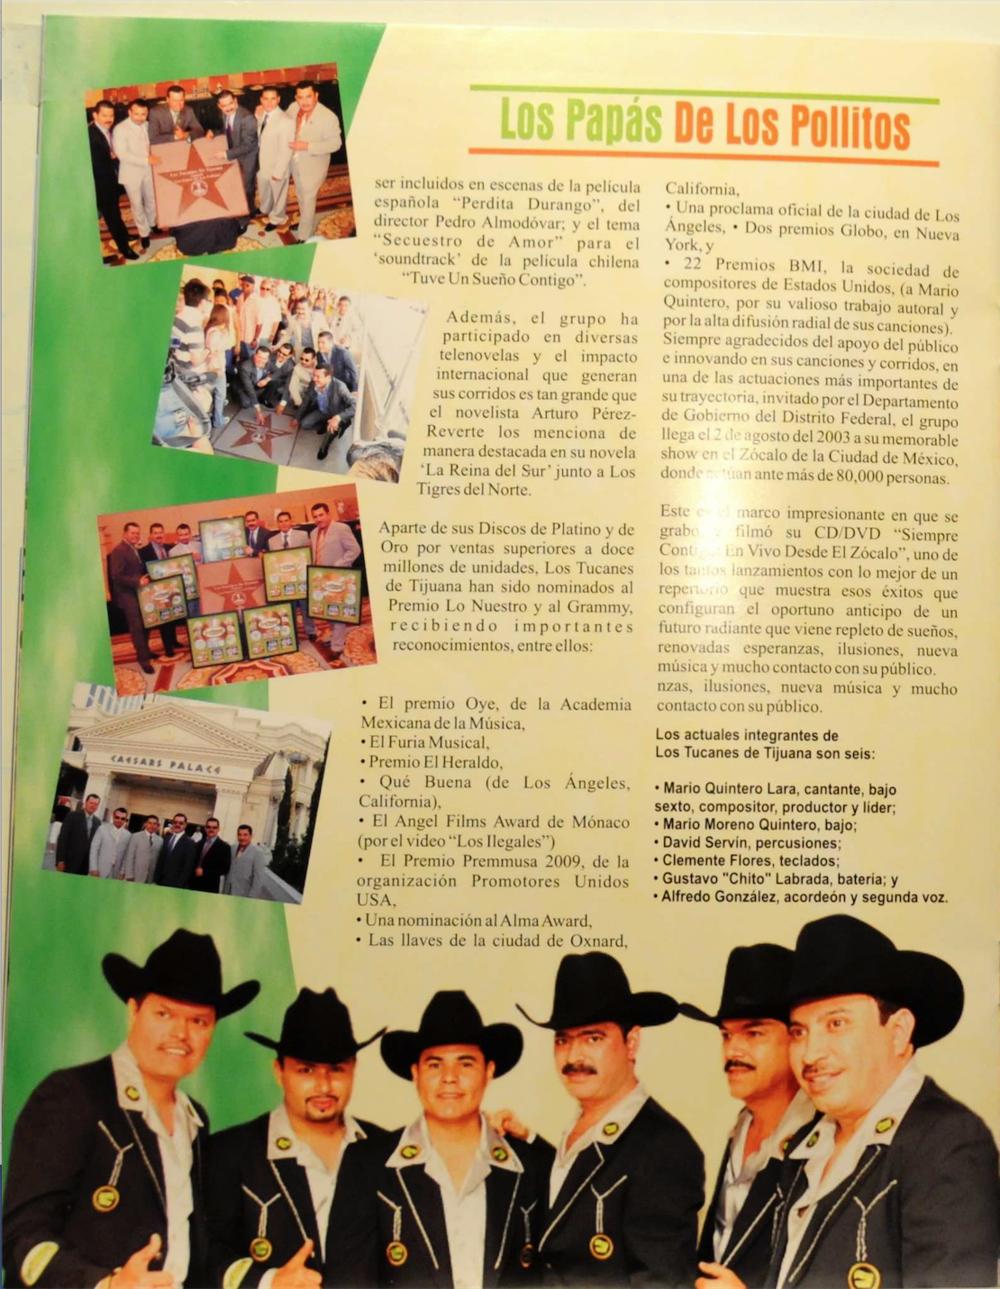 Galardon Musica-Estrella  Vegas-Tucanes .png